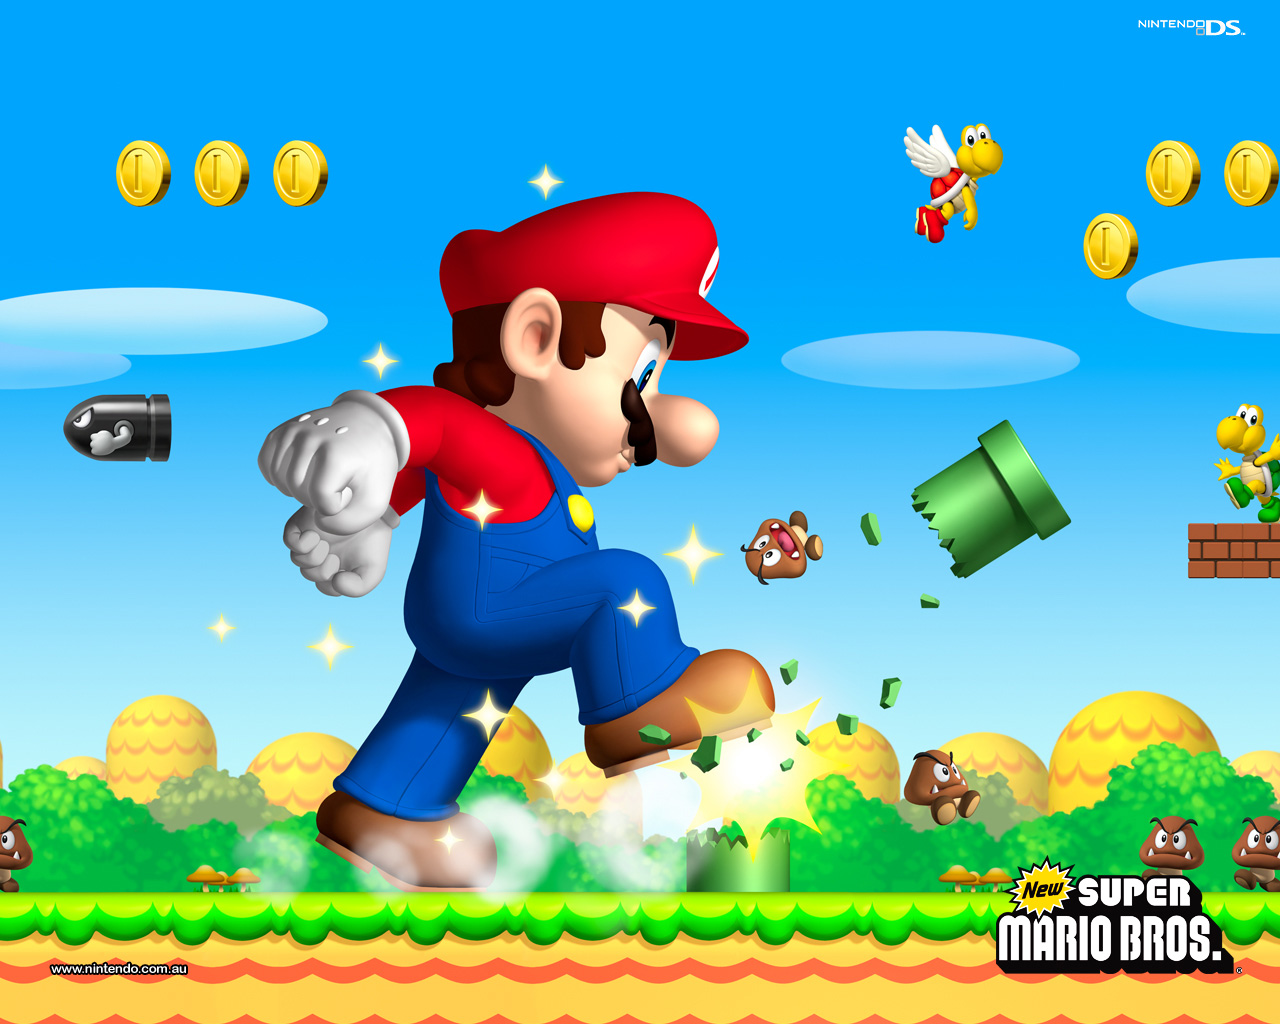 violent video games should not be banned images should violent video games be banned iwakuroleplay com